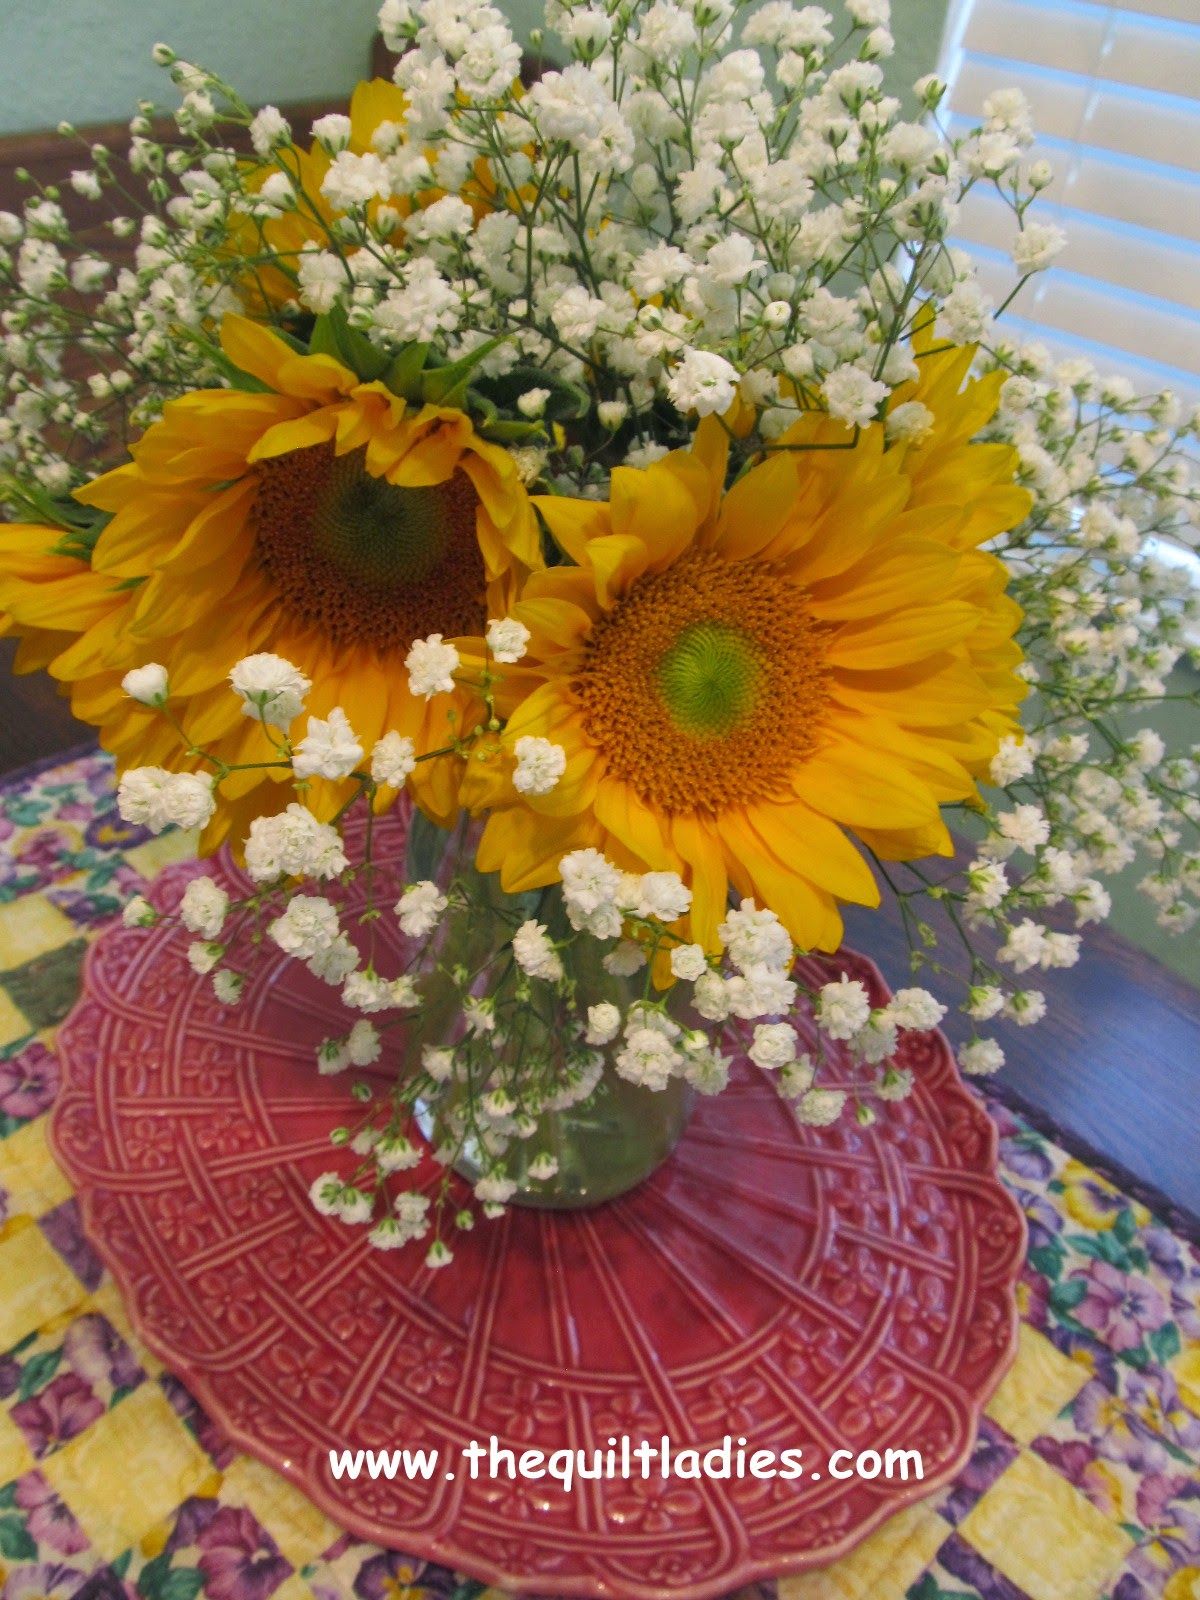 Sun Flower Beth Ann Strub (c) All Rights Reserved